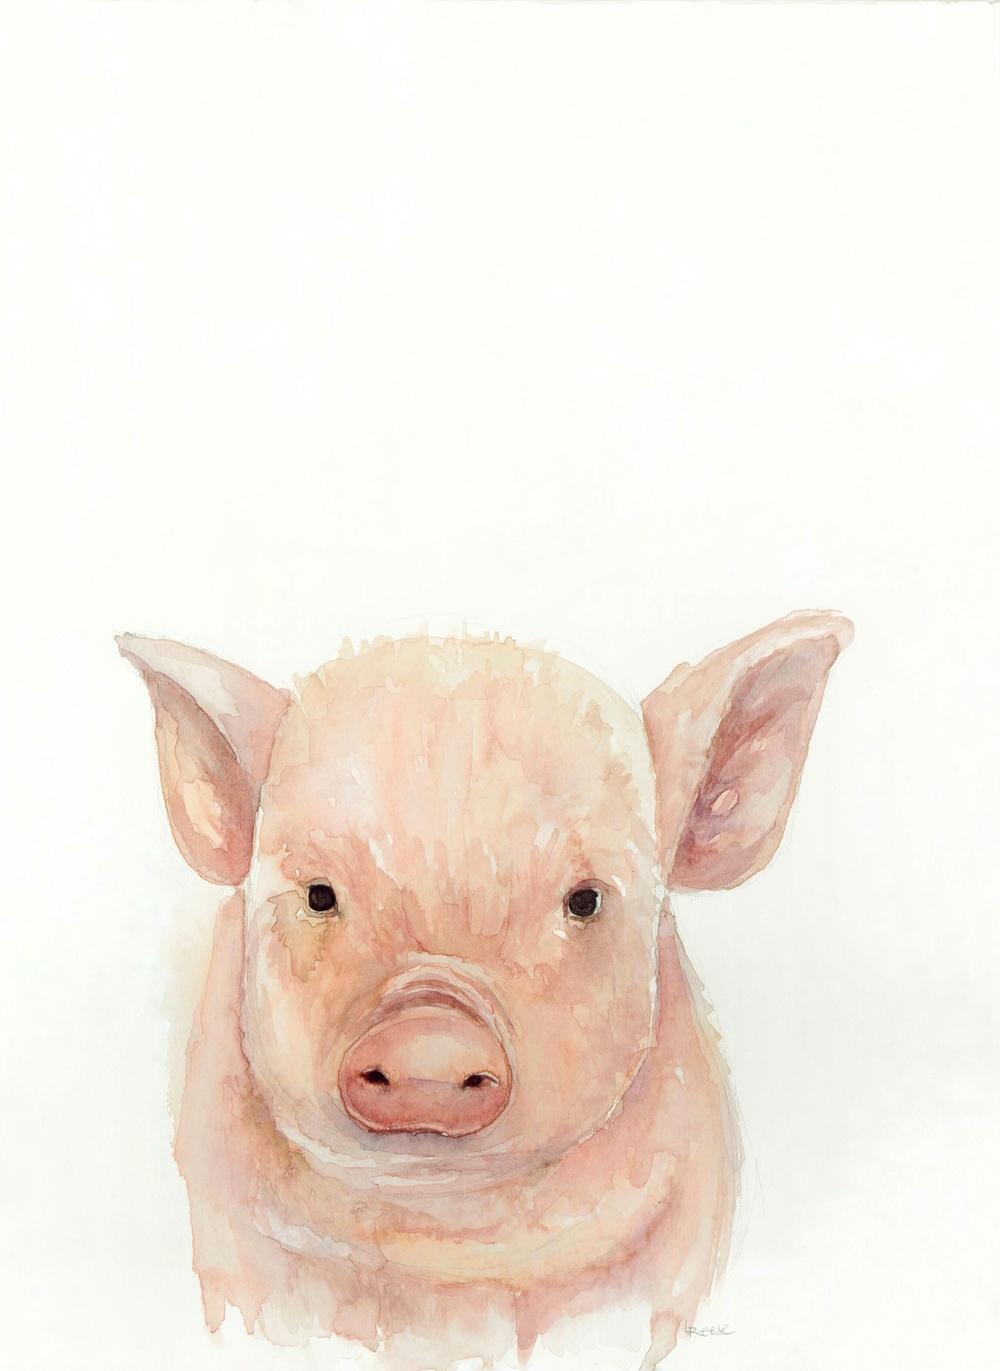 Baby Pig.jpeg